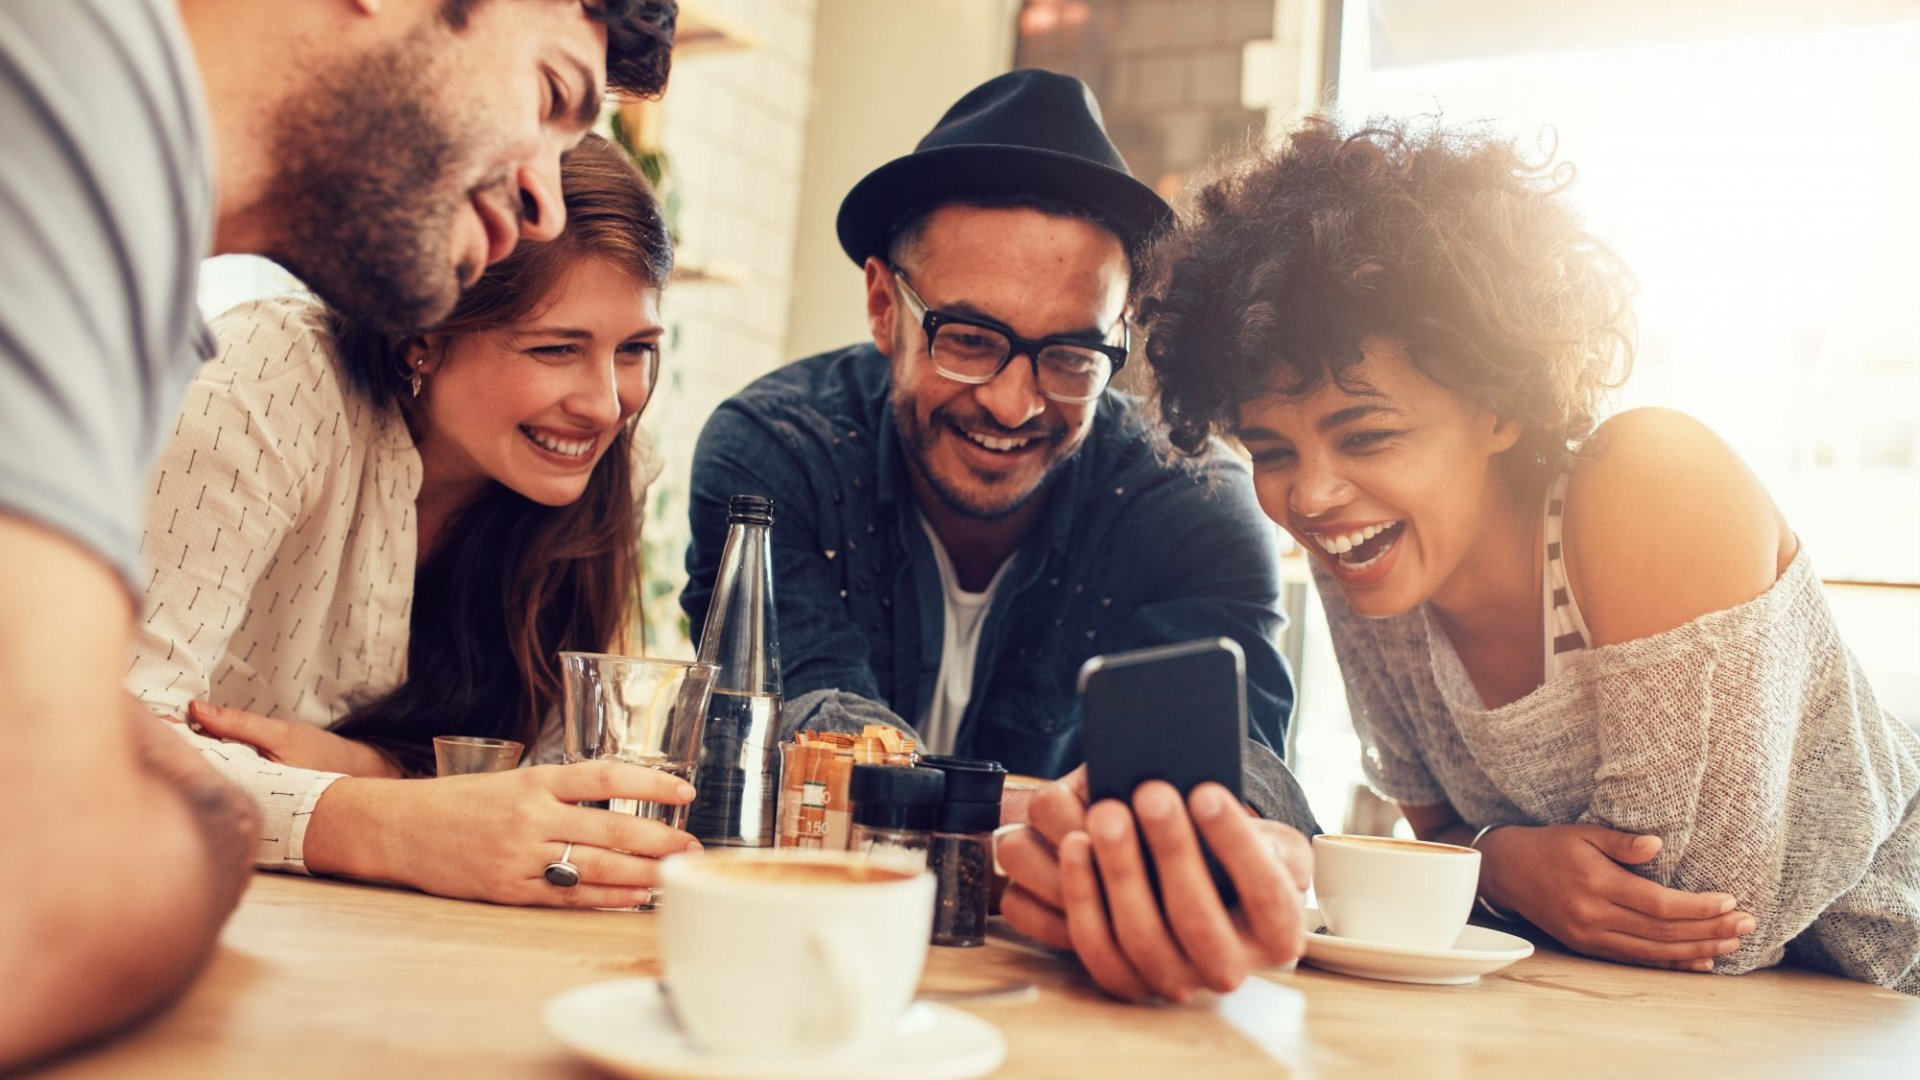 3 Ways Millennials Differ from Generation Z in 2019 Trends